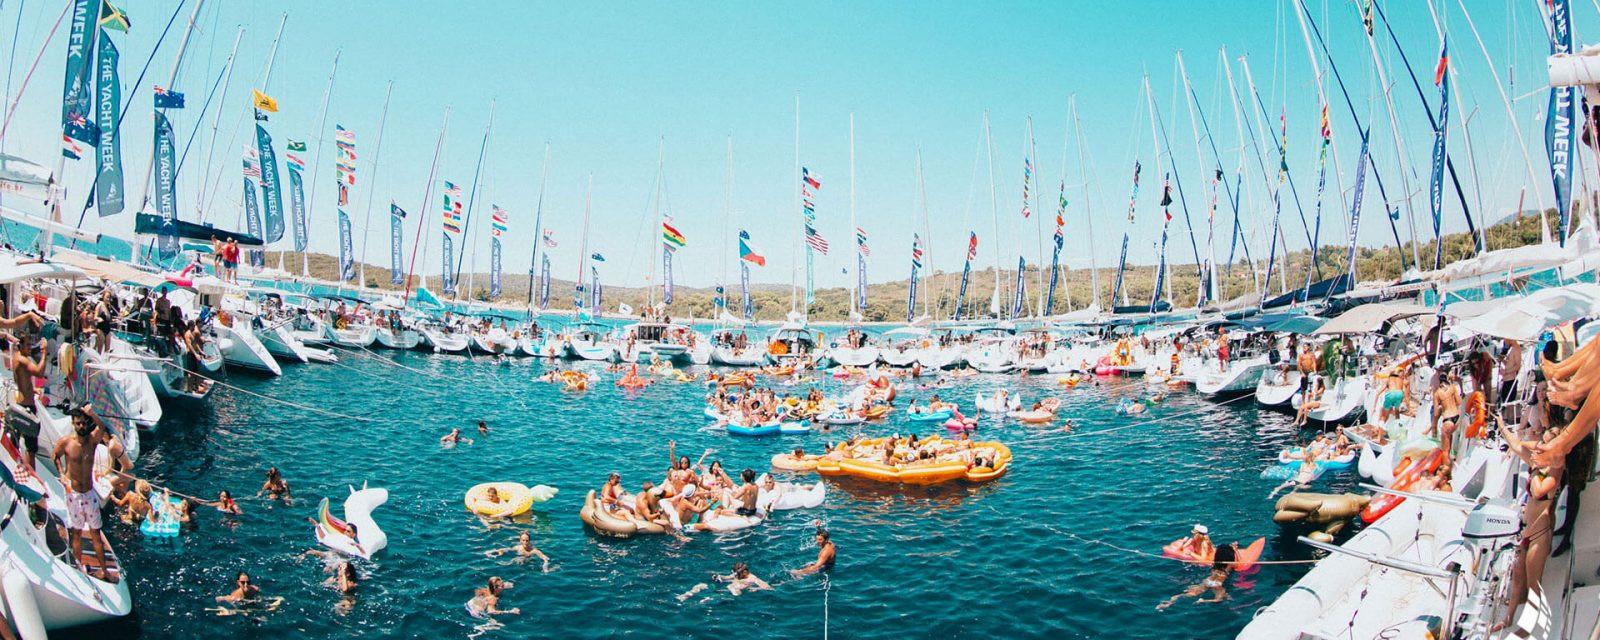 Raft Circle Party